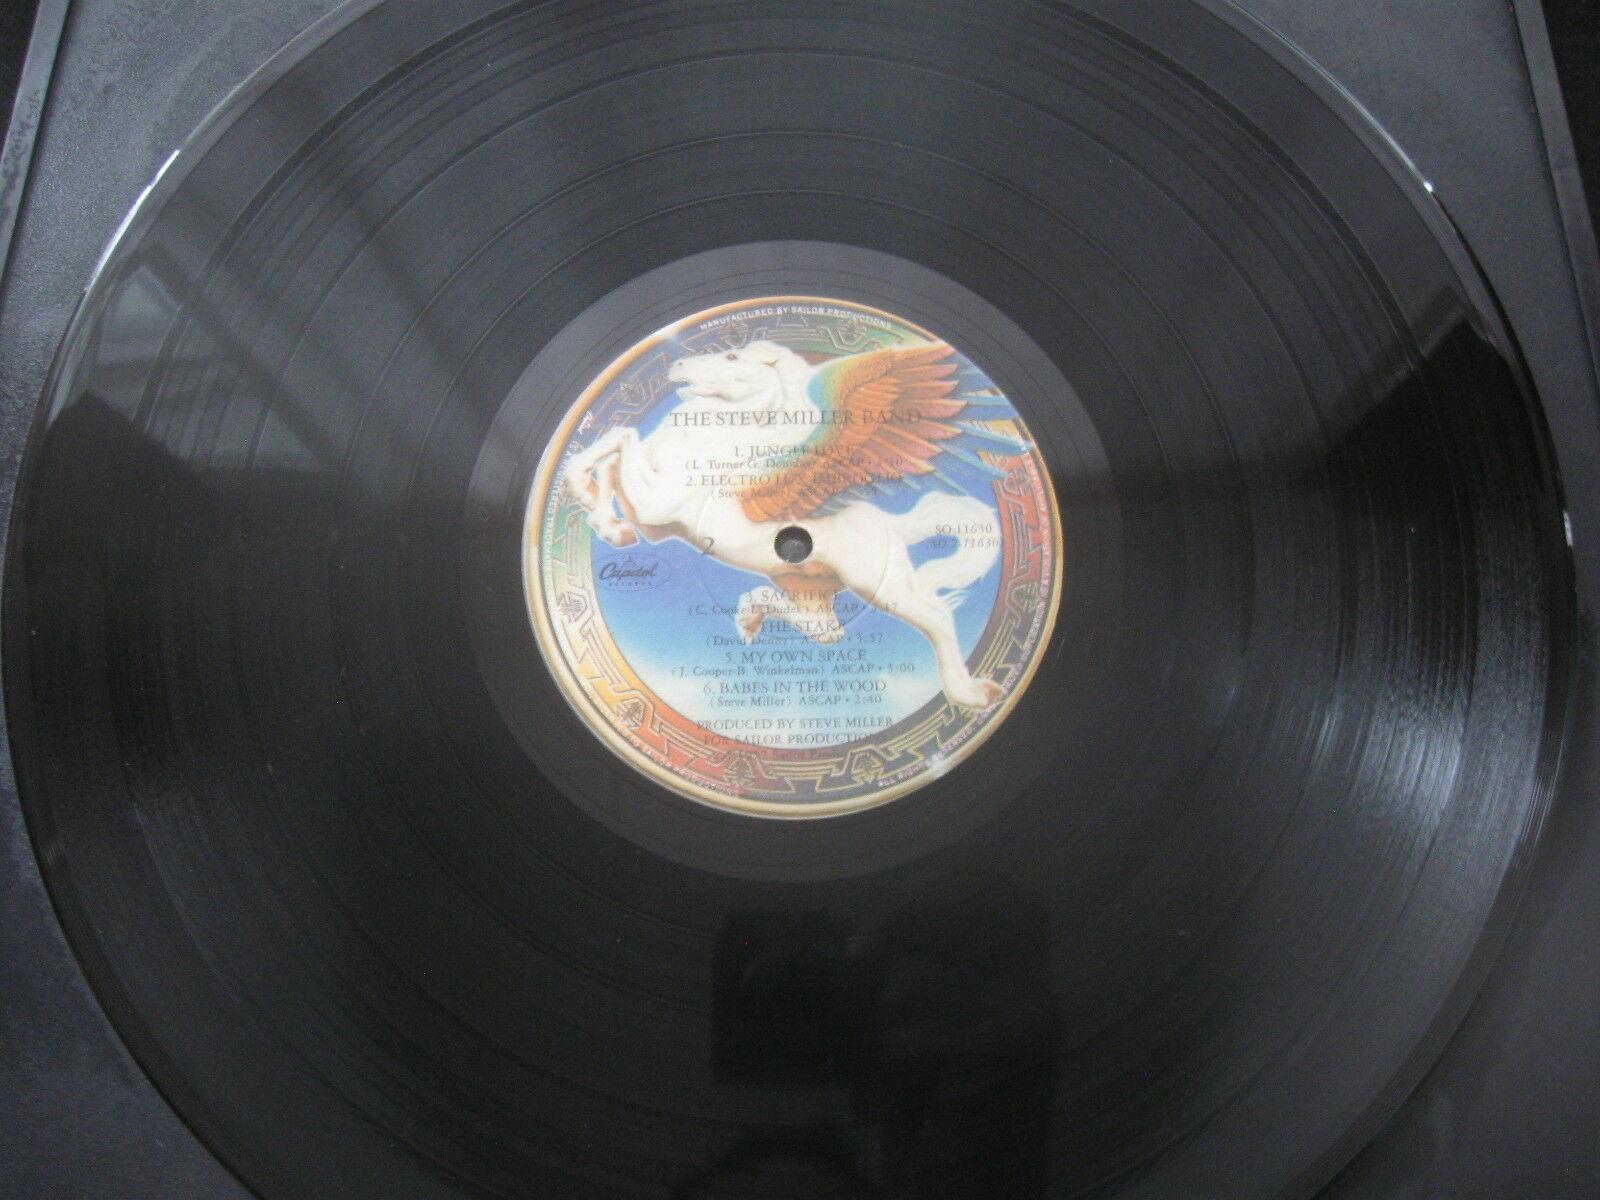 Steve Miller Band Book Of Dreams Capitol SQ-11630 Vinyl Record LP Open Shrink image 7